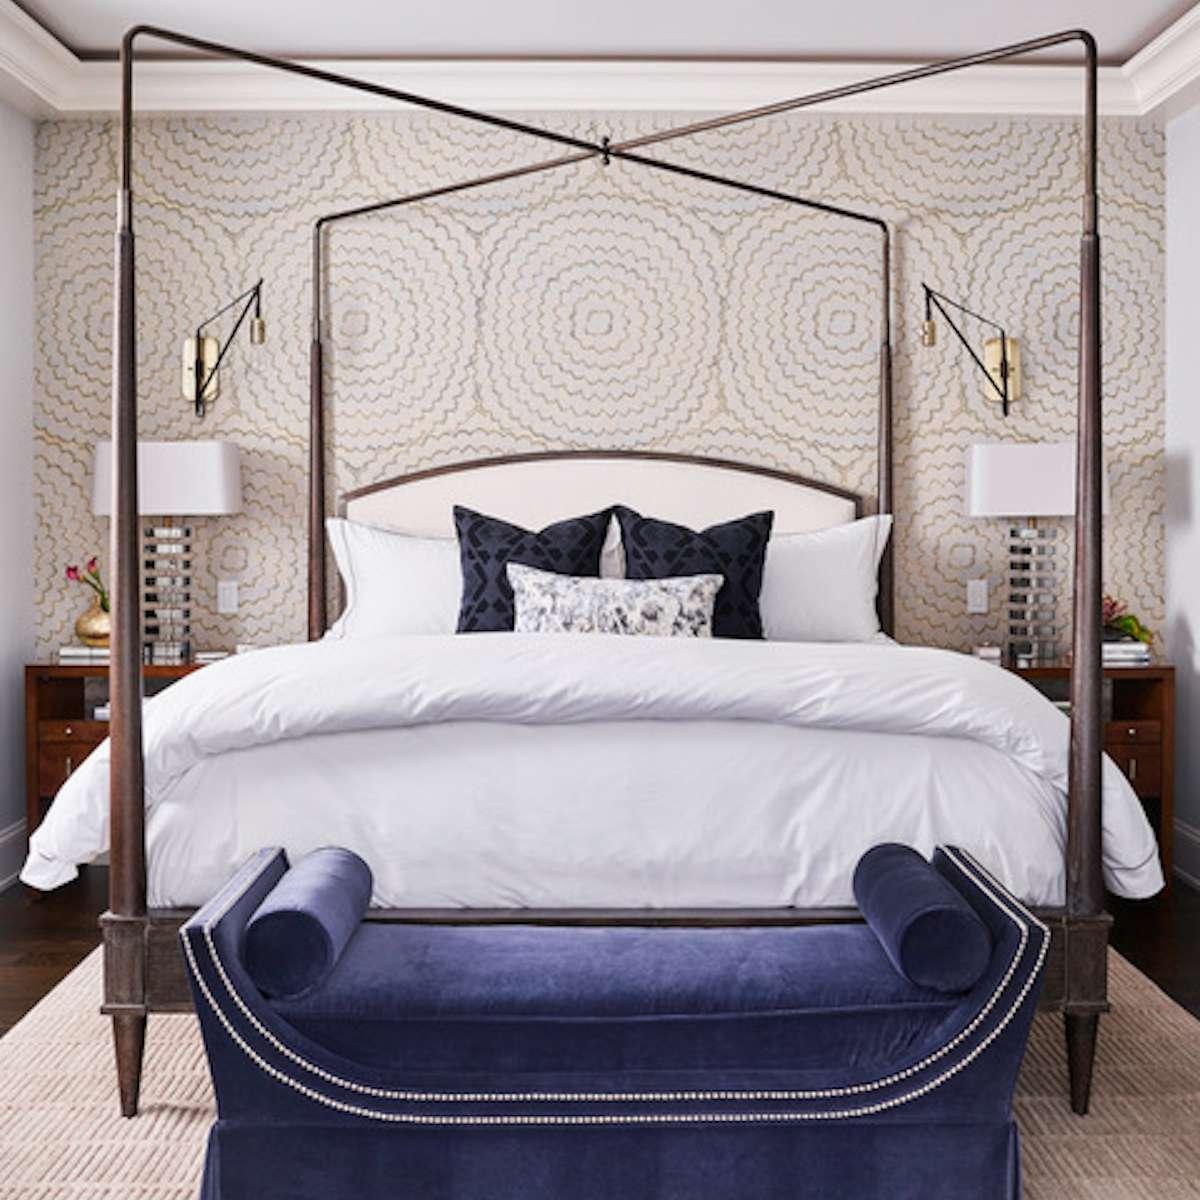 2021 Bedroom Design Trends, According To Experts